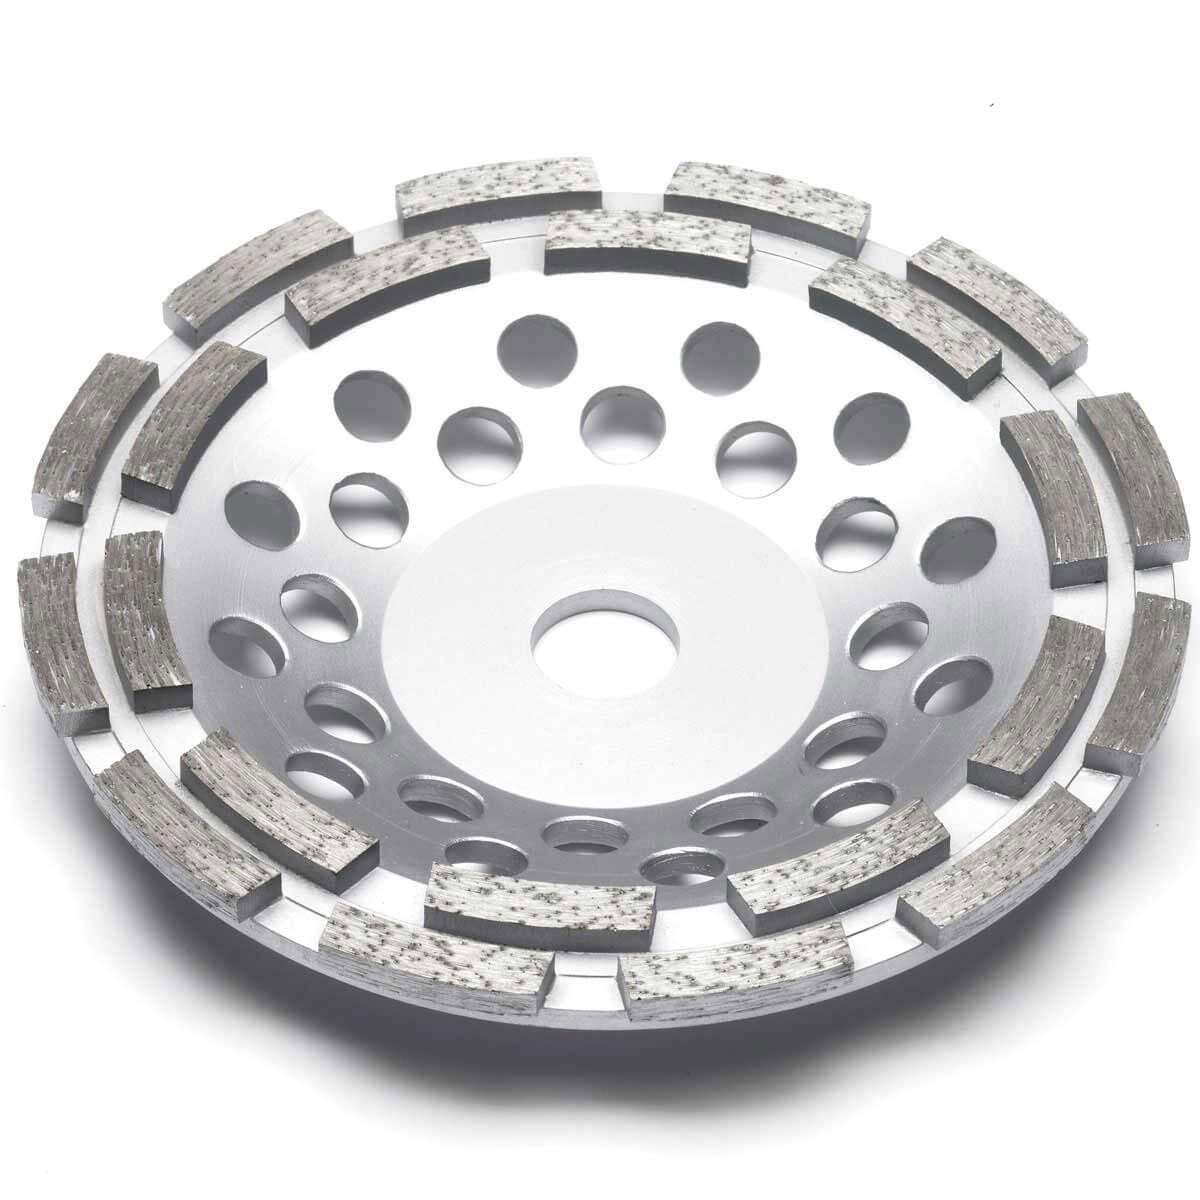 MK Double Row Diamond Cup Wheel